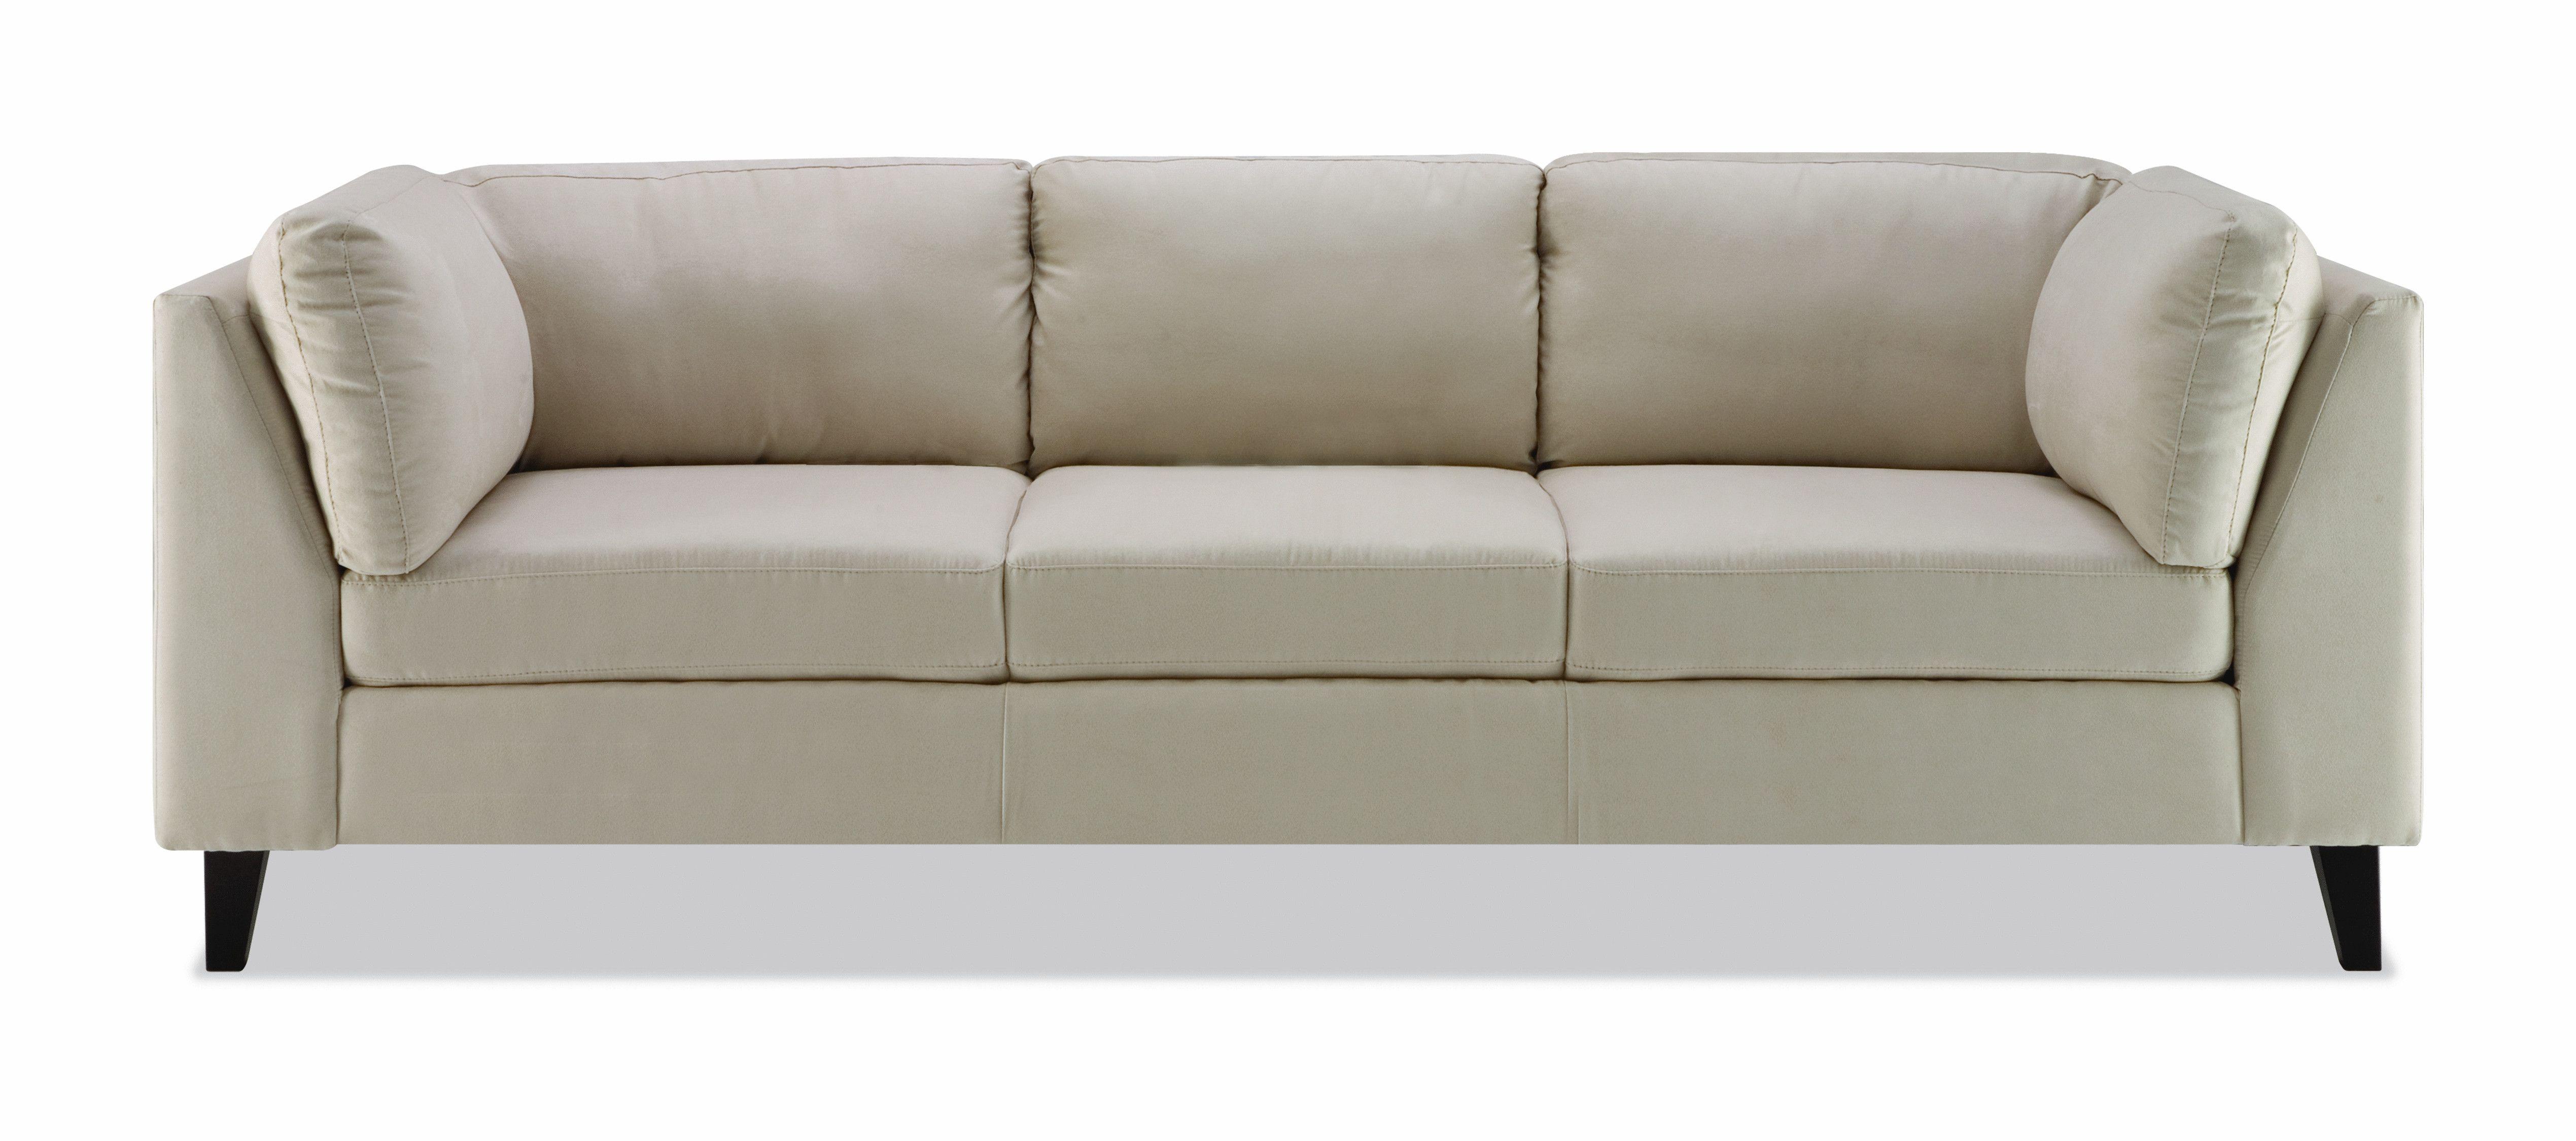 The EQ3 Salema sofa ing fy cozy fortableness